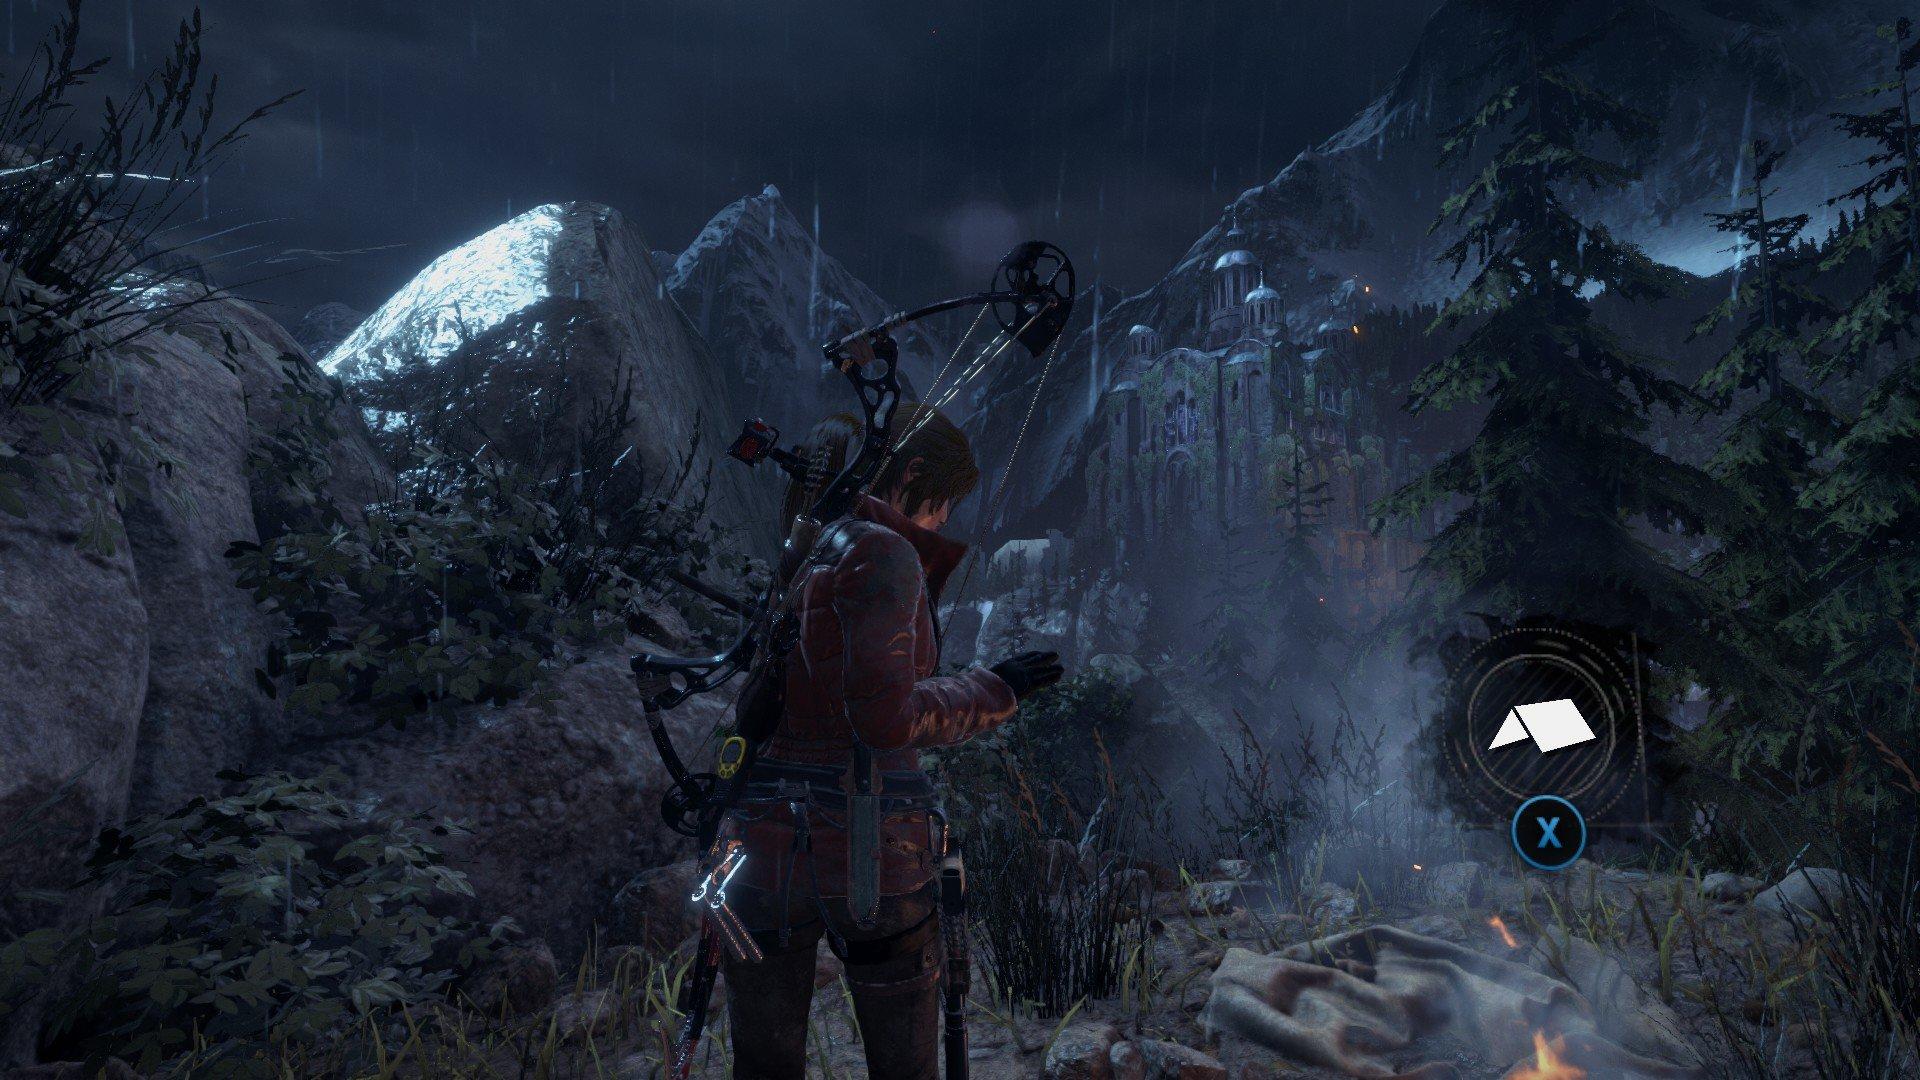 Rise of the Tomb Raider или да когда же этот медведь сдохнет?. - Изображение 19